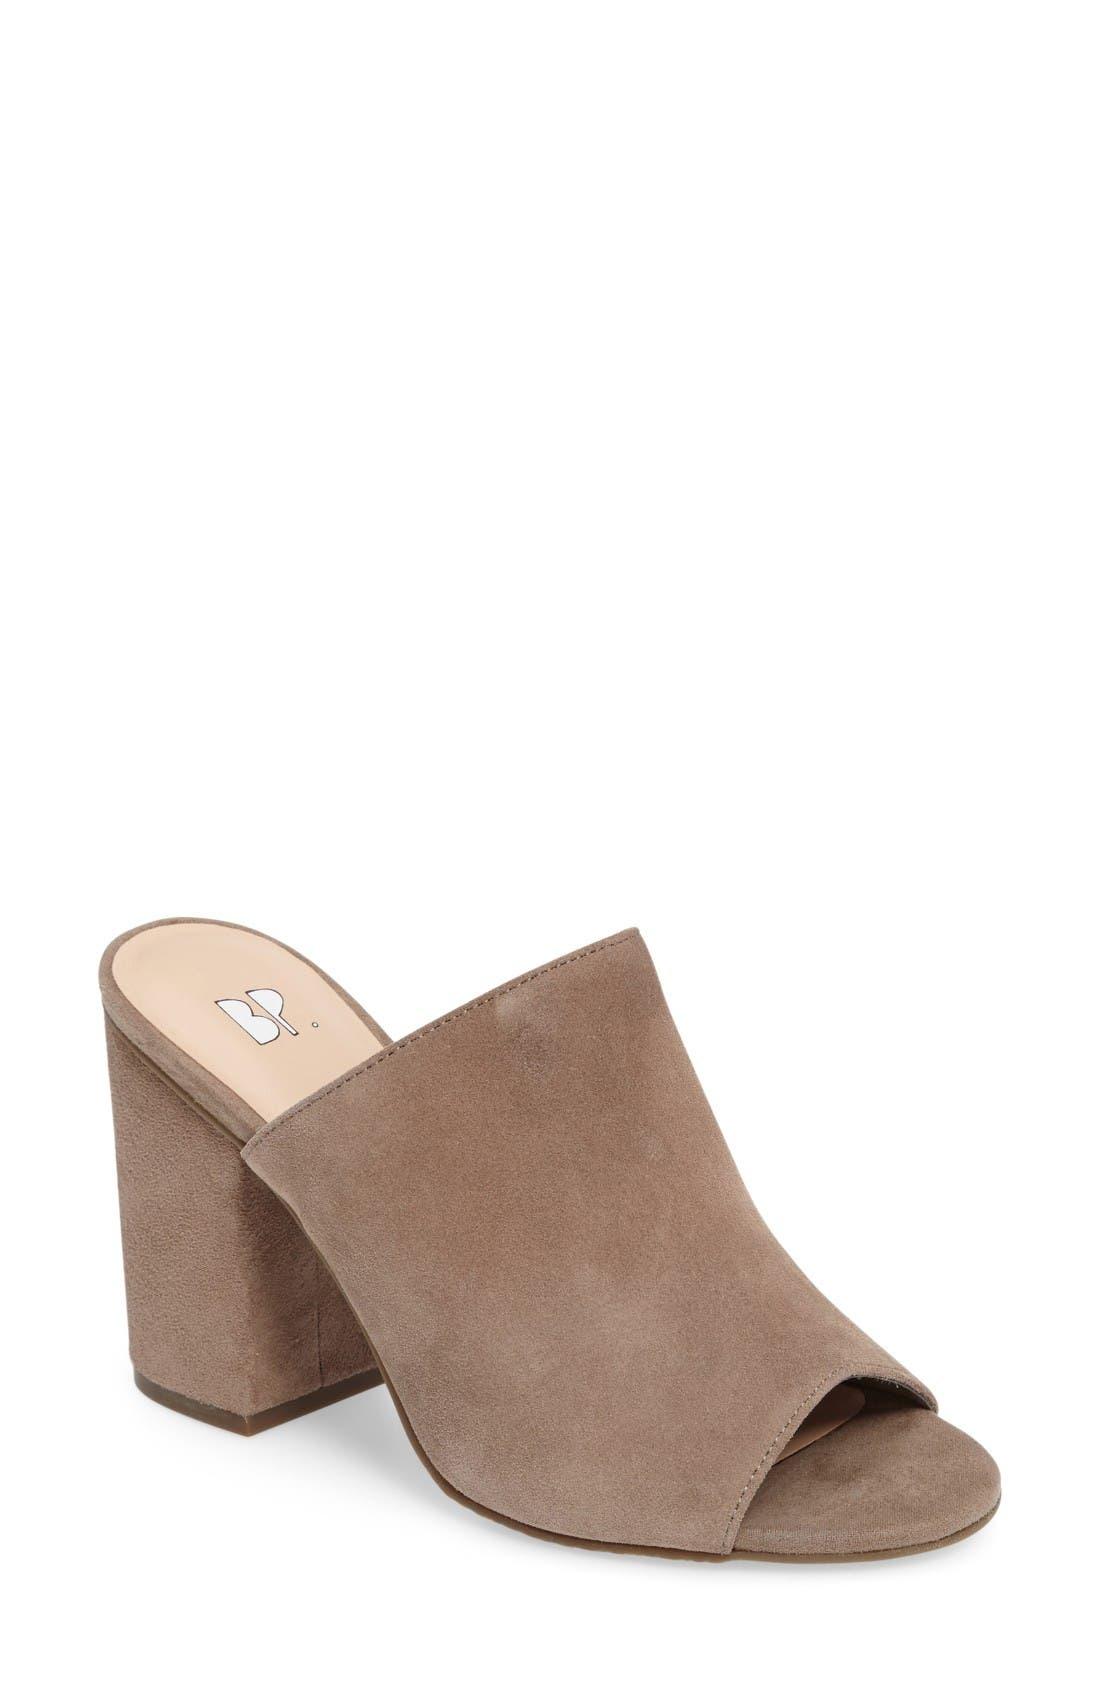 BP. Tale Block Heel Sandal